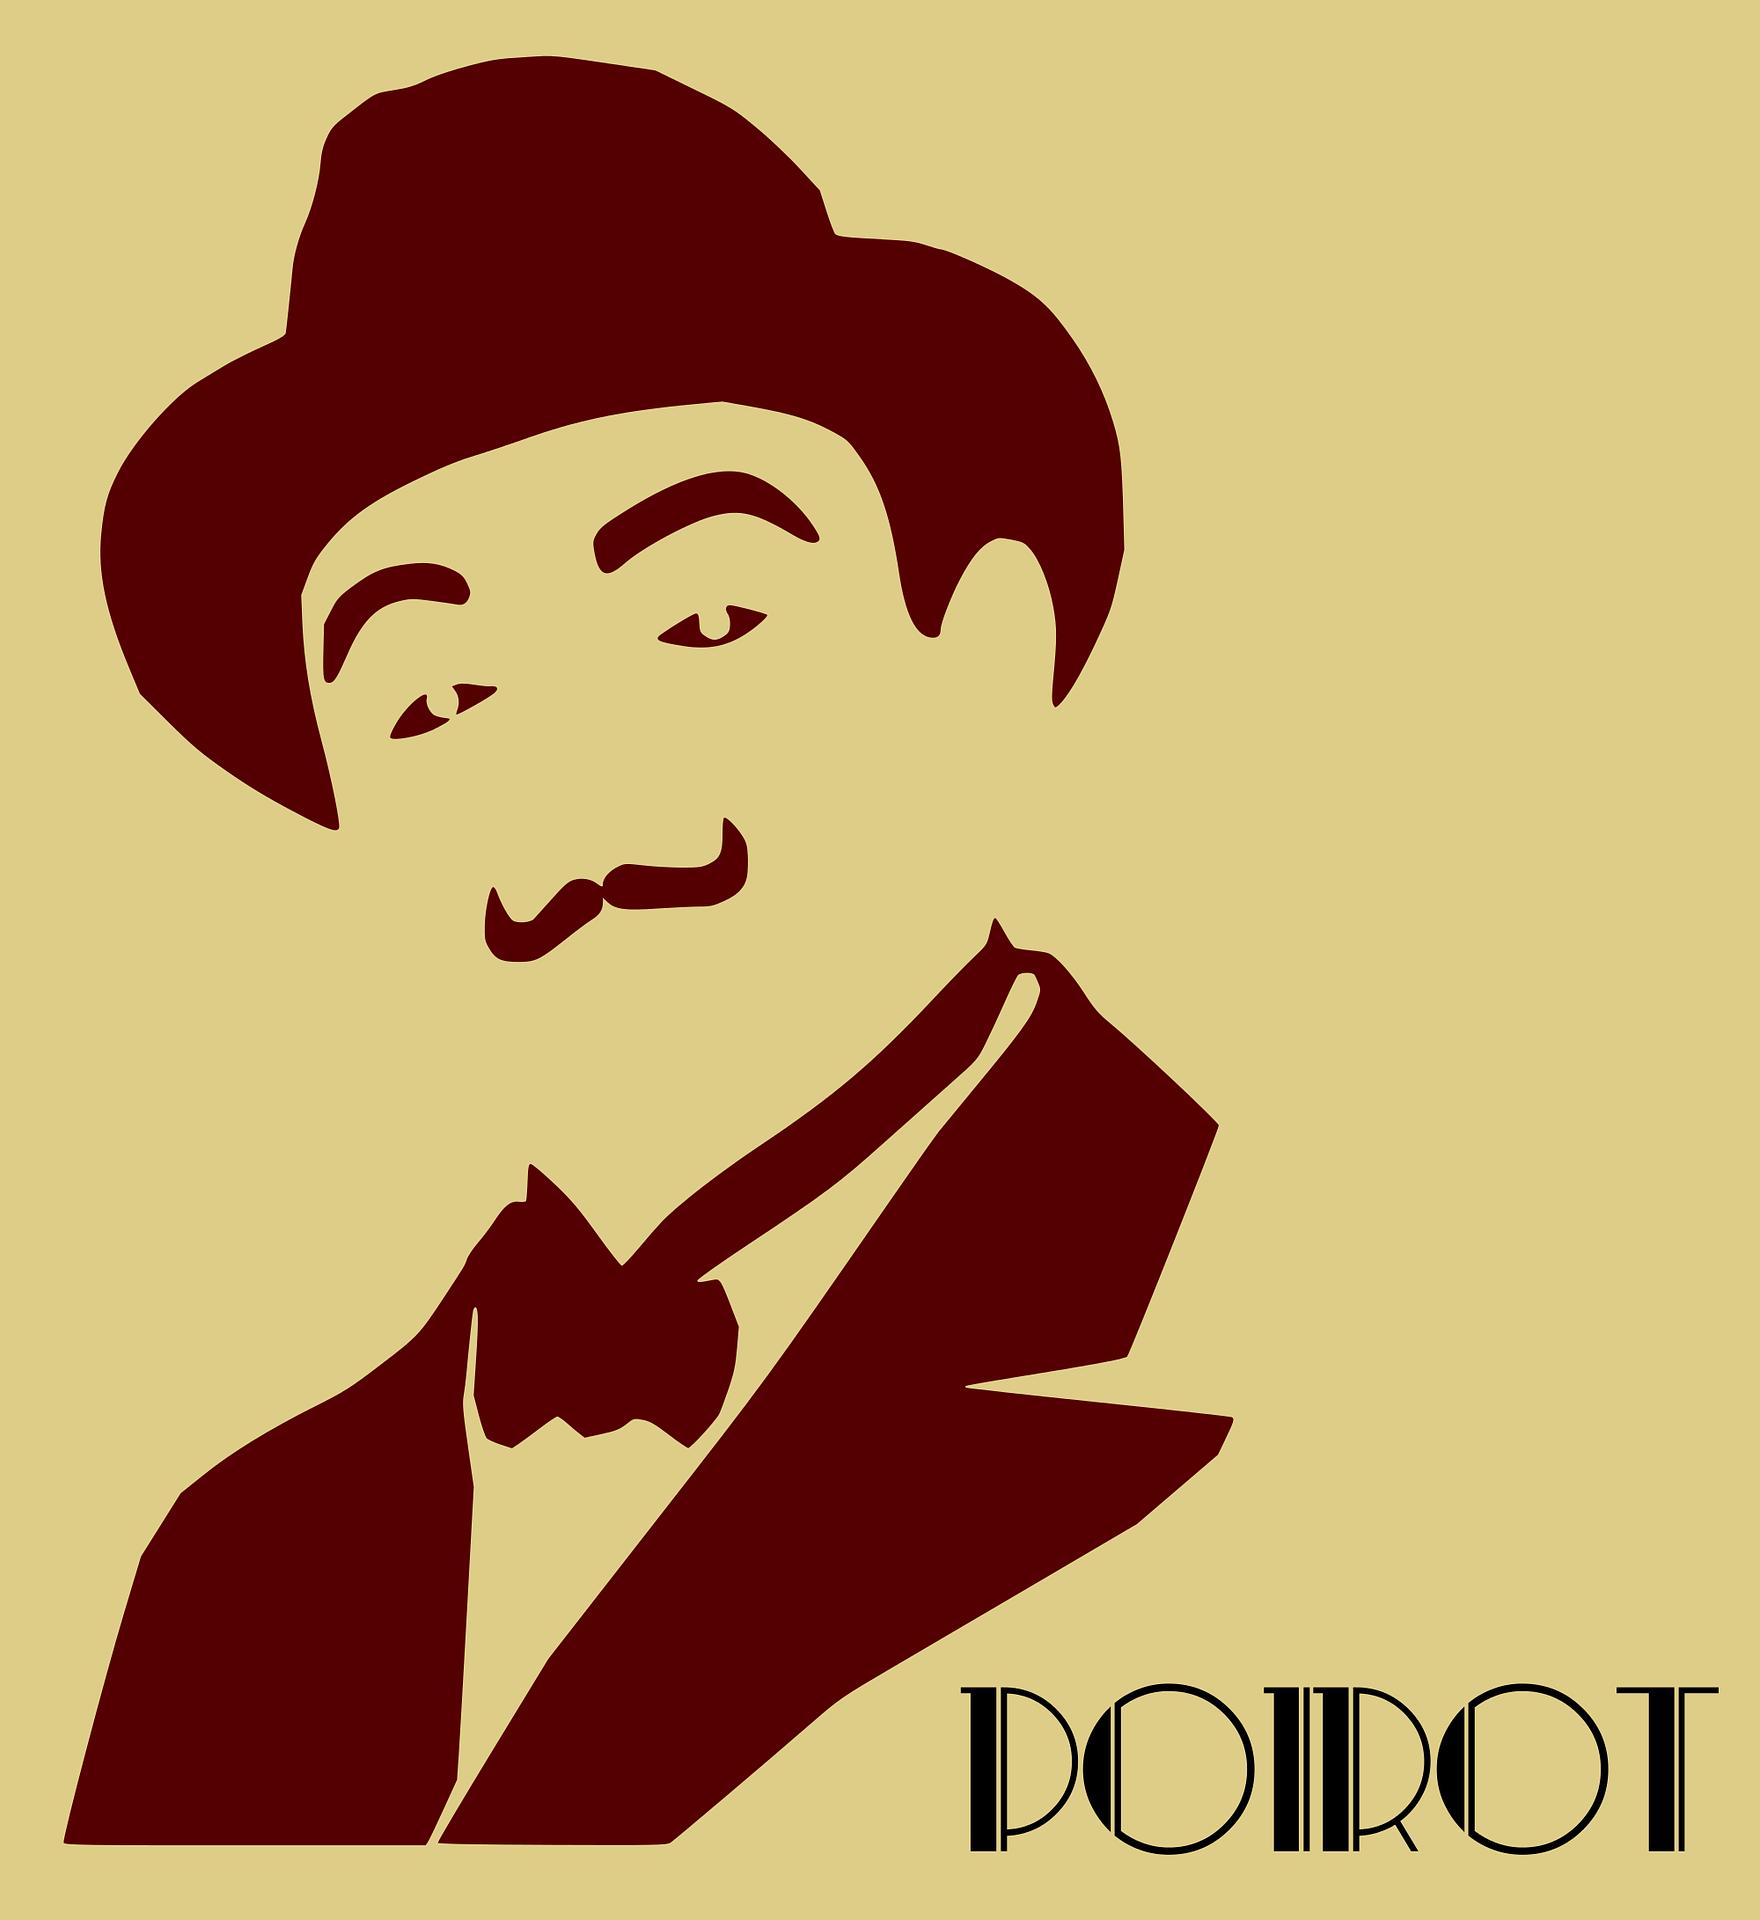 hercule-poirot-1986535_1920